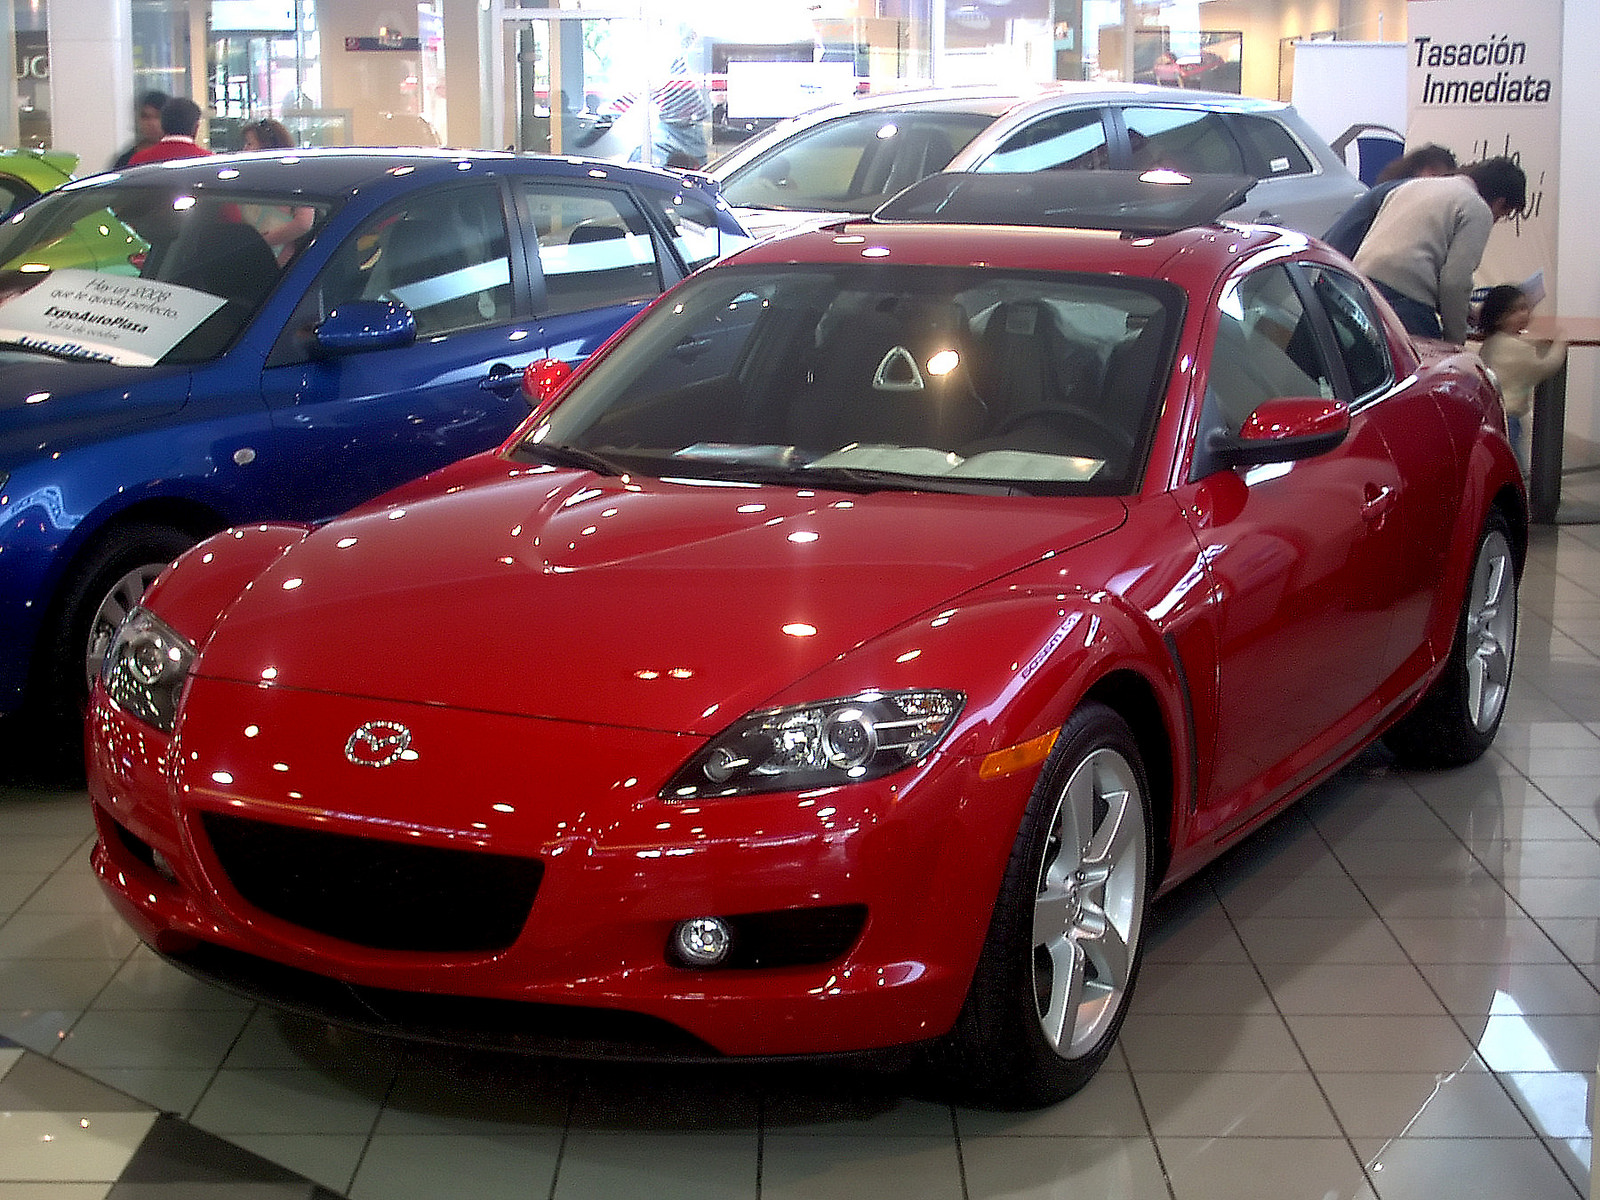 Title: Mazda RX-8 2008